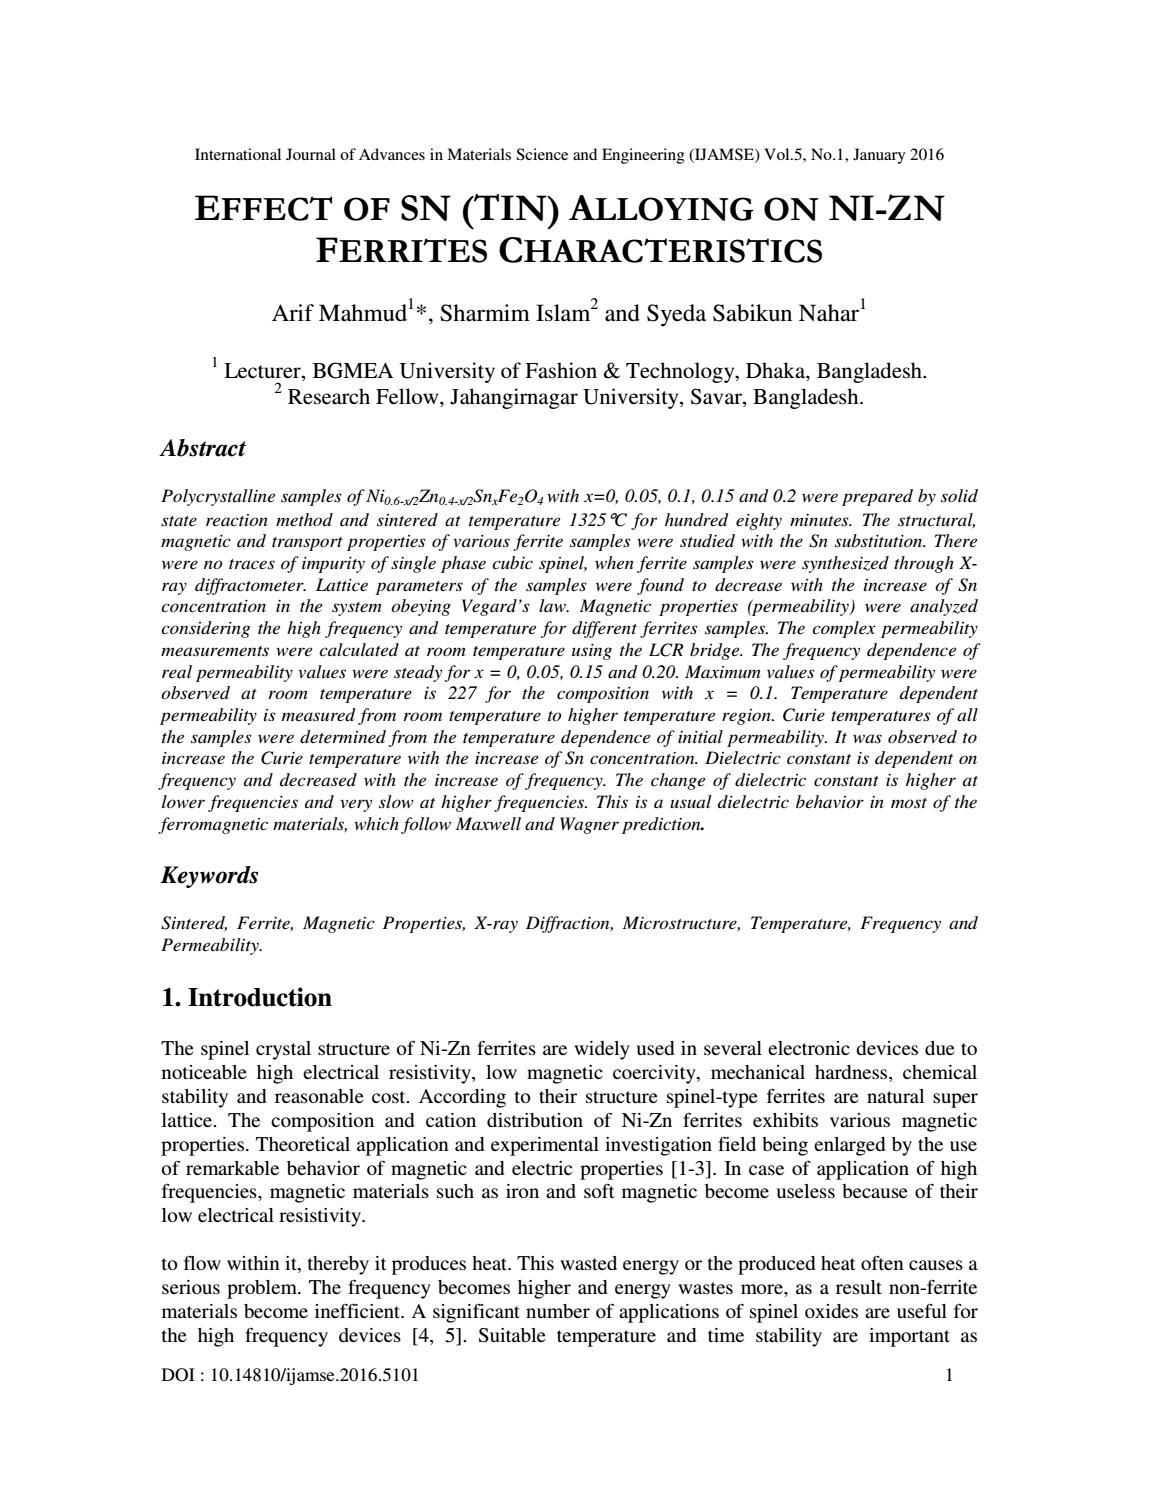 EFFECT OF SN (TIN) ALLOYING ON NI-ZN FERRITES CHARACTERISTICS by